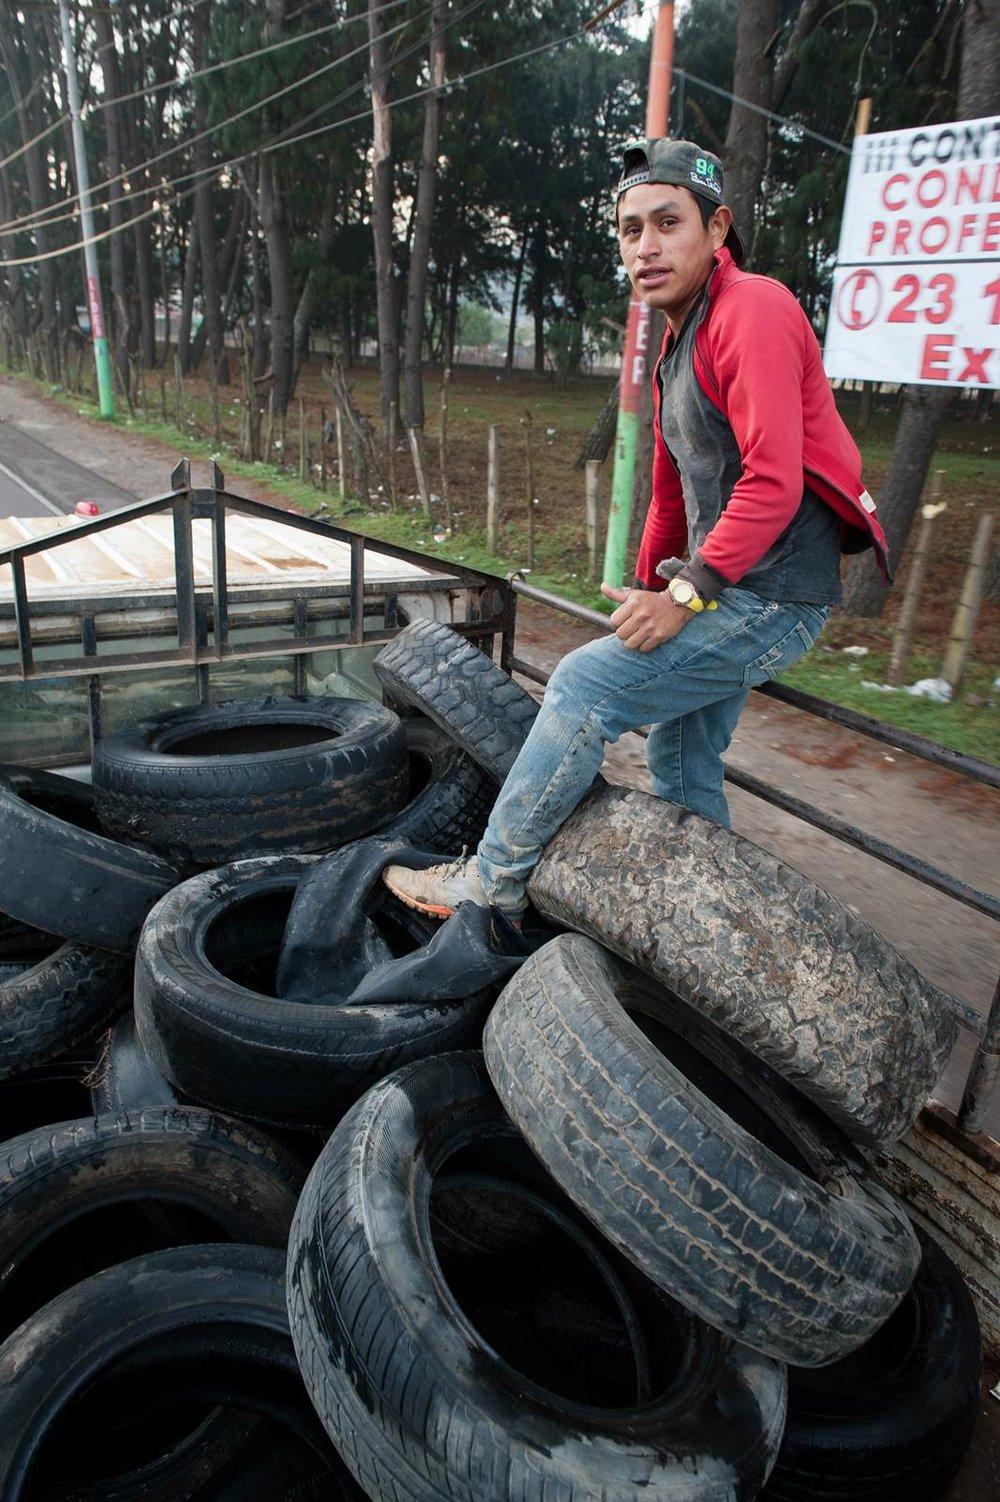 1540 LONG WAY HOME_2016_Guatemala_photographers without borders_ronbwilson_160304_711.jpg